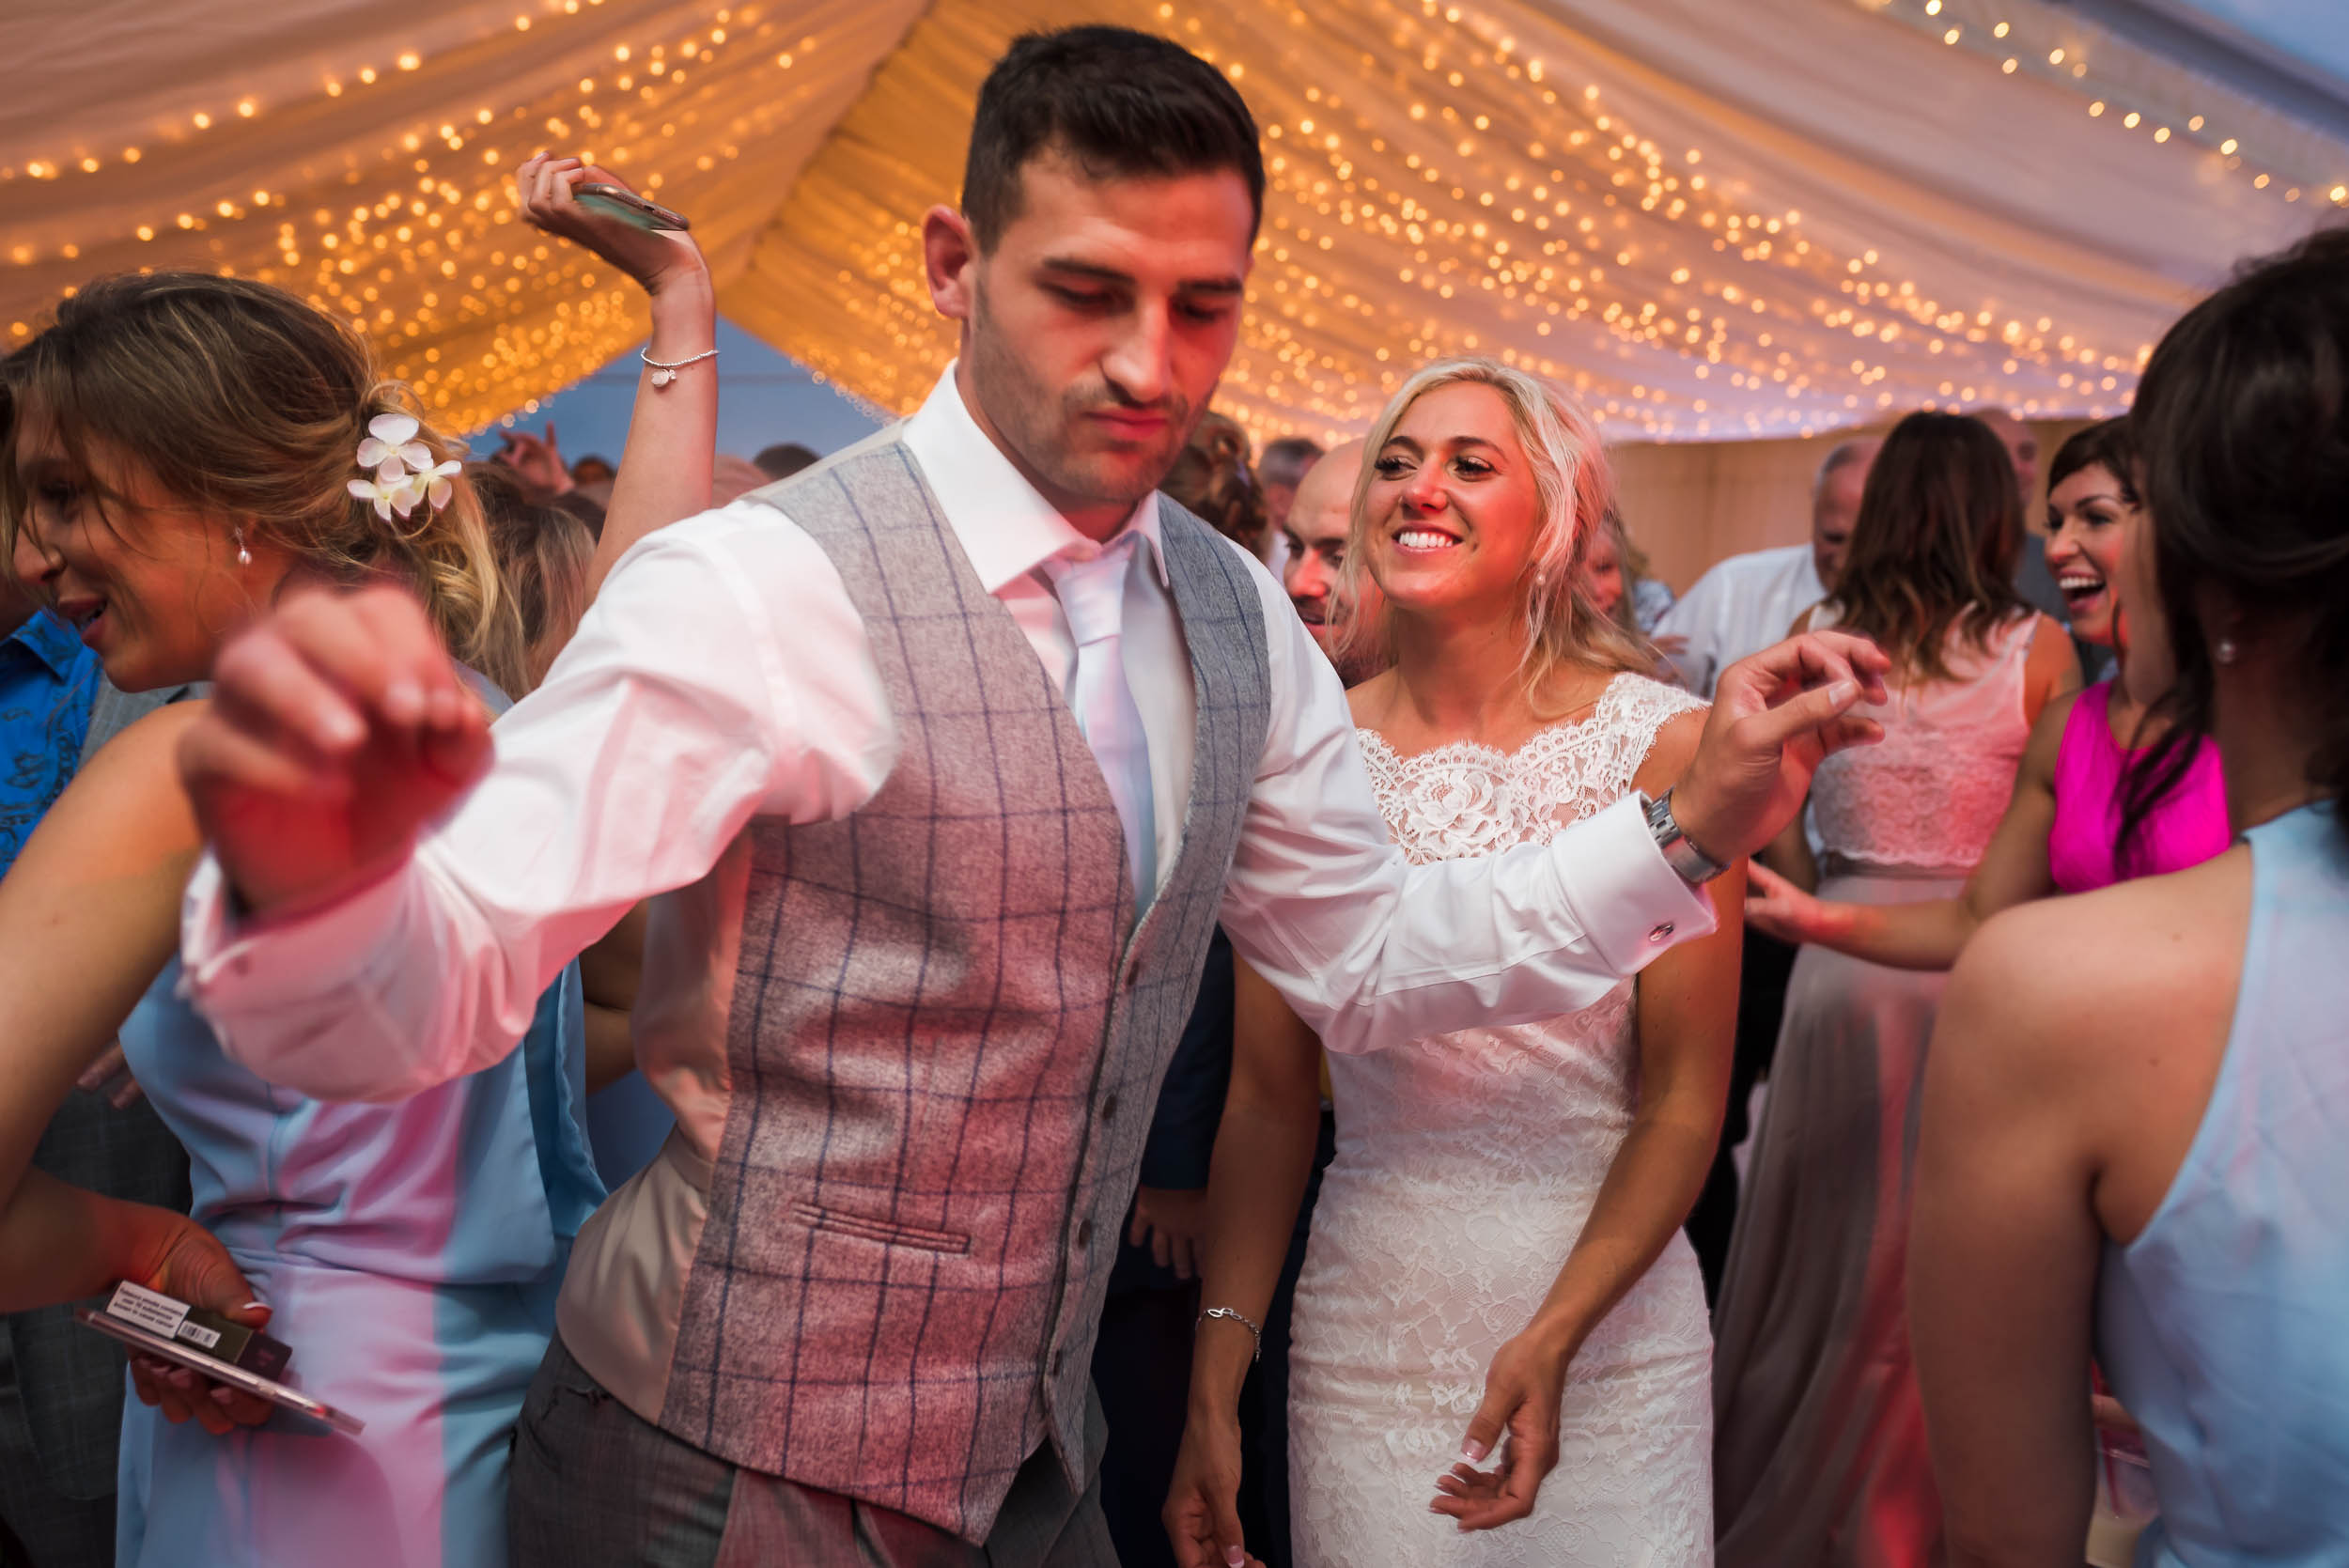 NC-20170722-sophie-and-jonny-wedding-1763.jpg